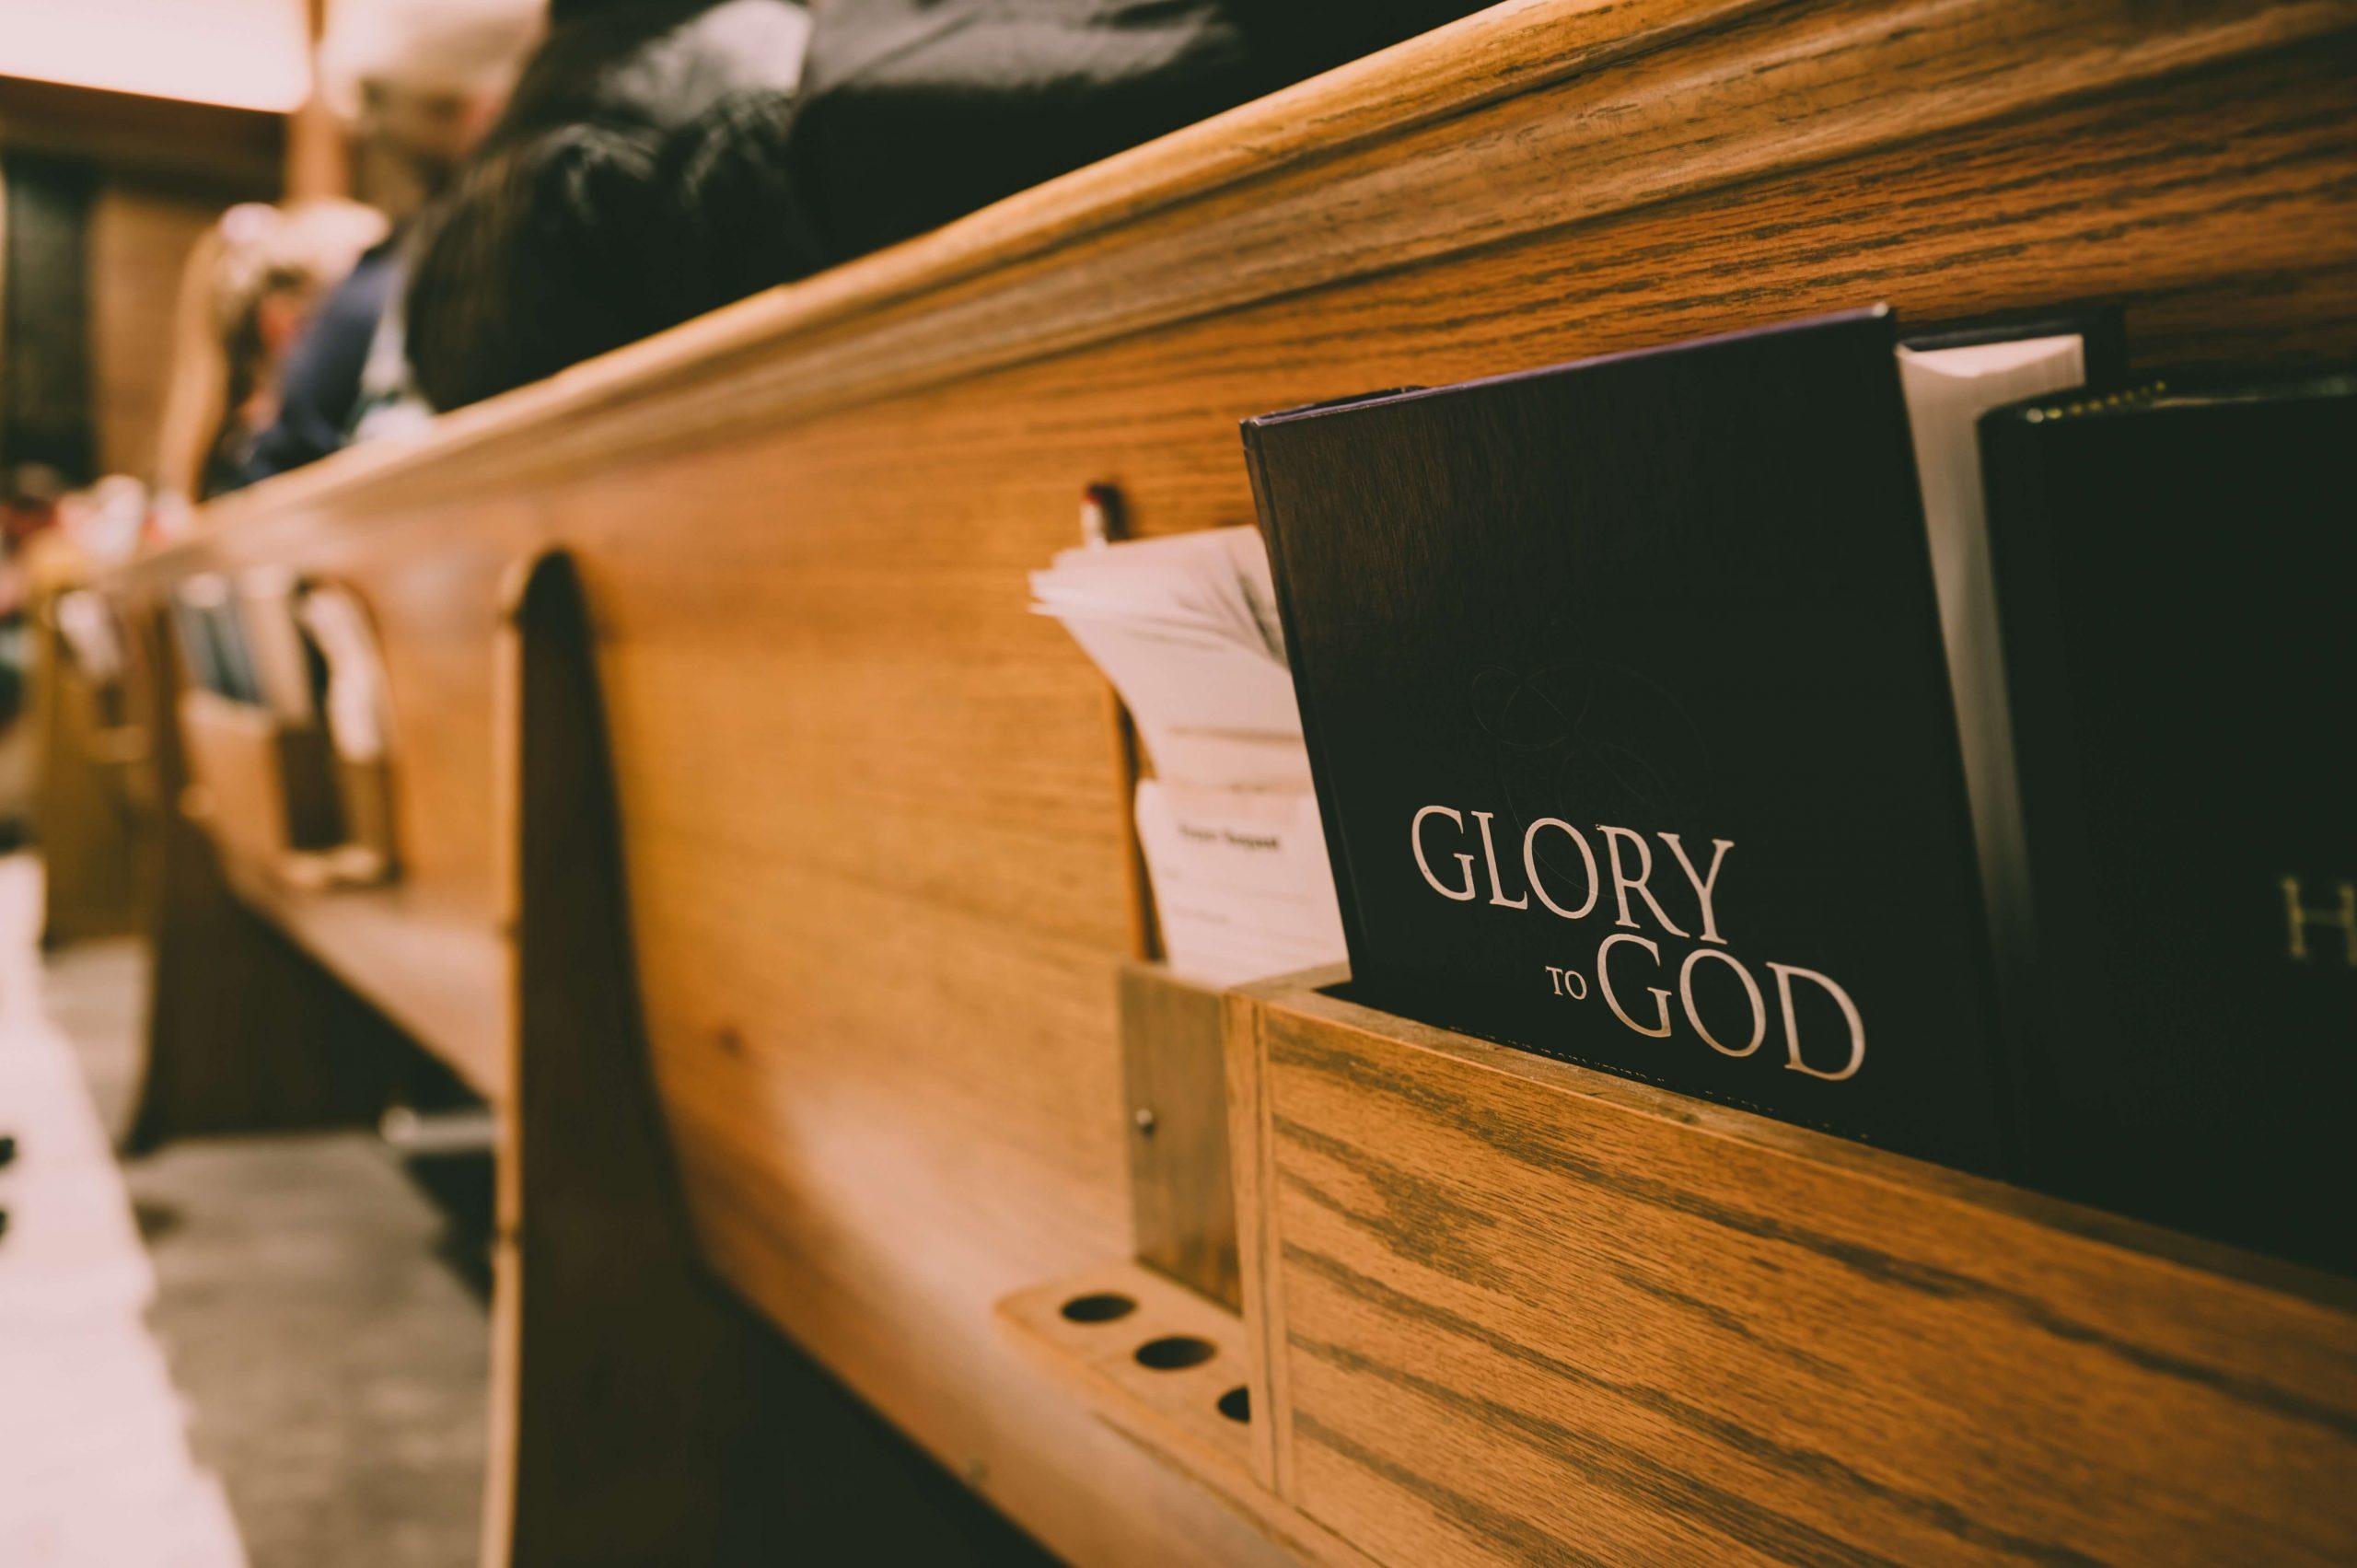 glory-to-god-book-3633711